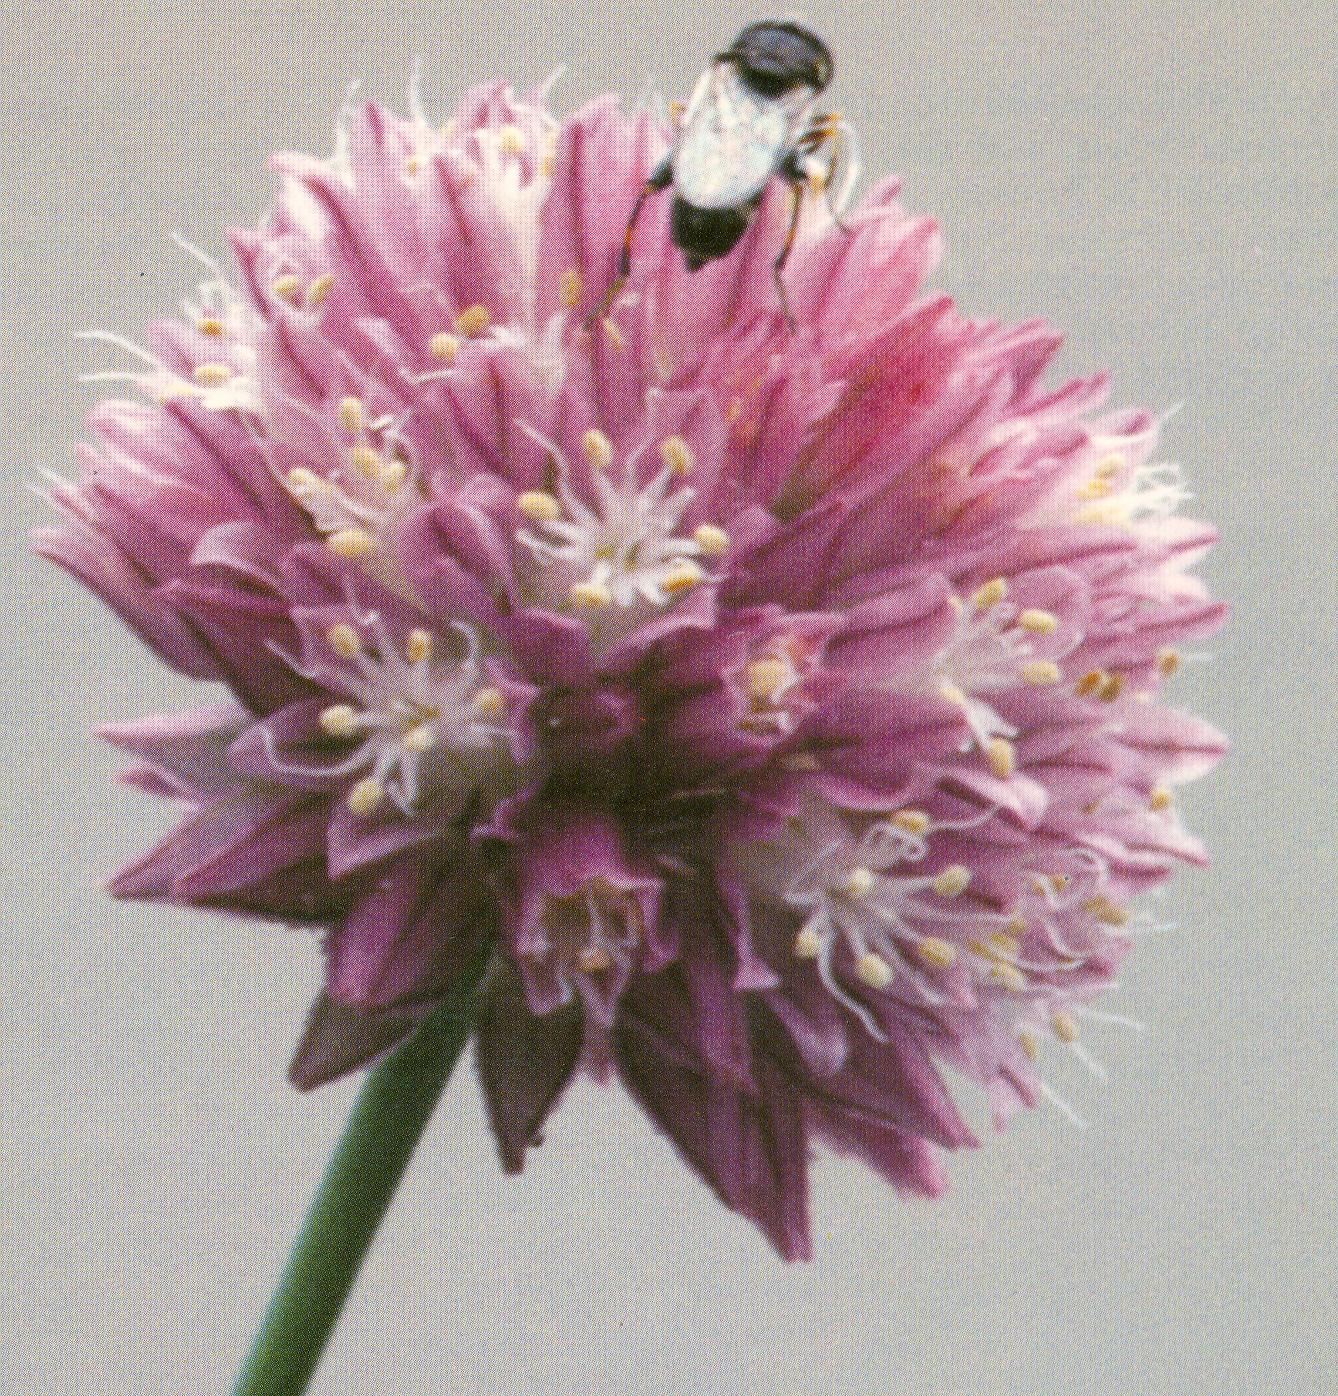 Allium%20barszczewskii2.jpg